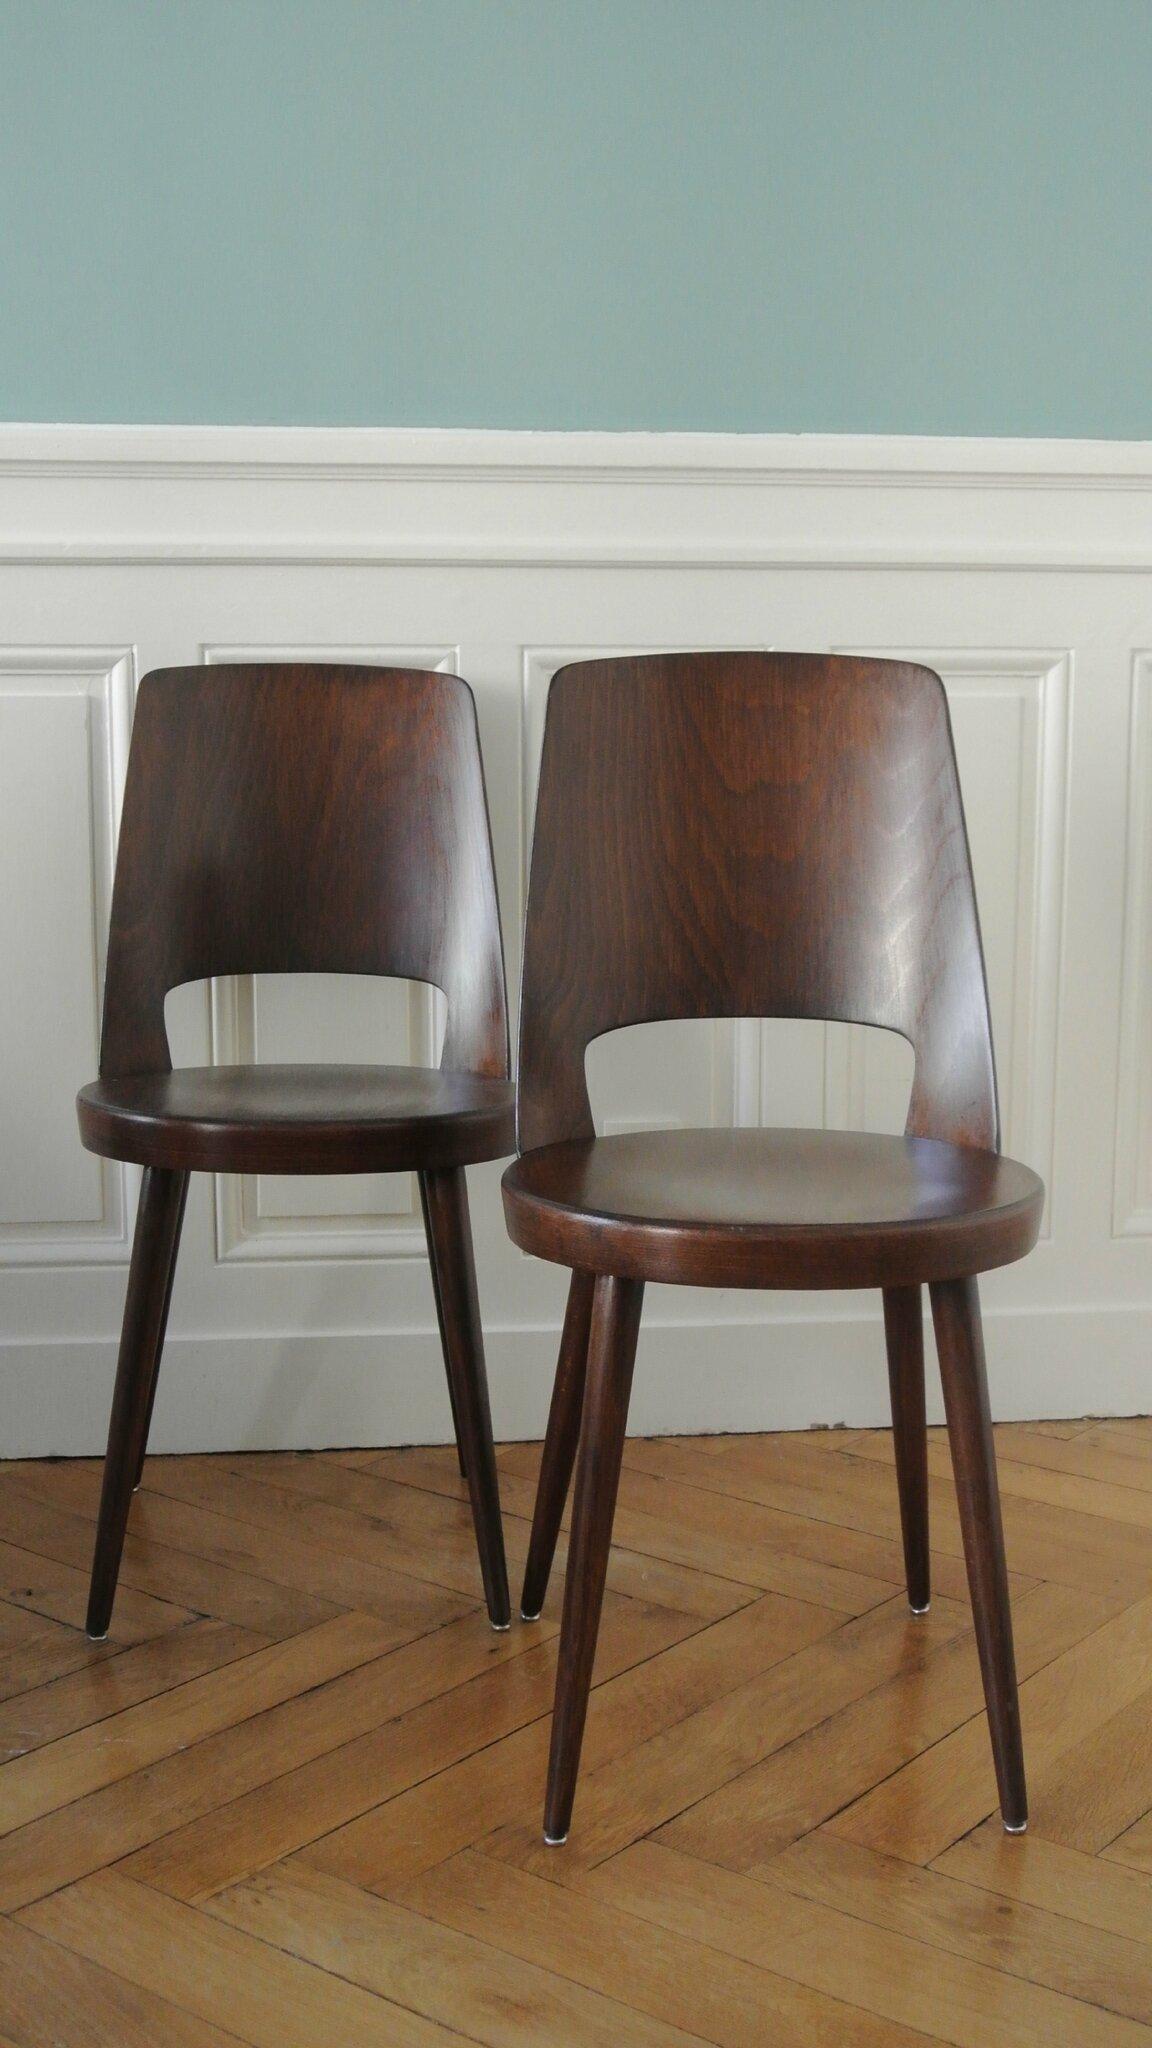 suite de chaises bistrot baumann ann es 60 solveig vintage galerie. Black Bedroom Furniture Sets. Home Design Ideas